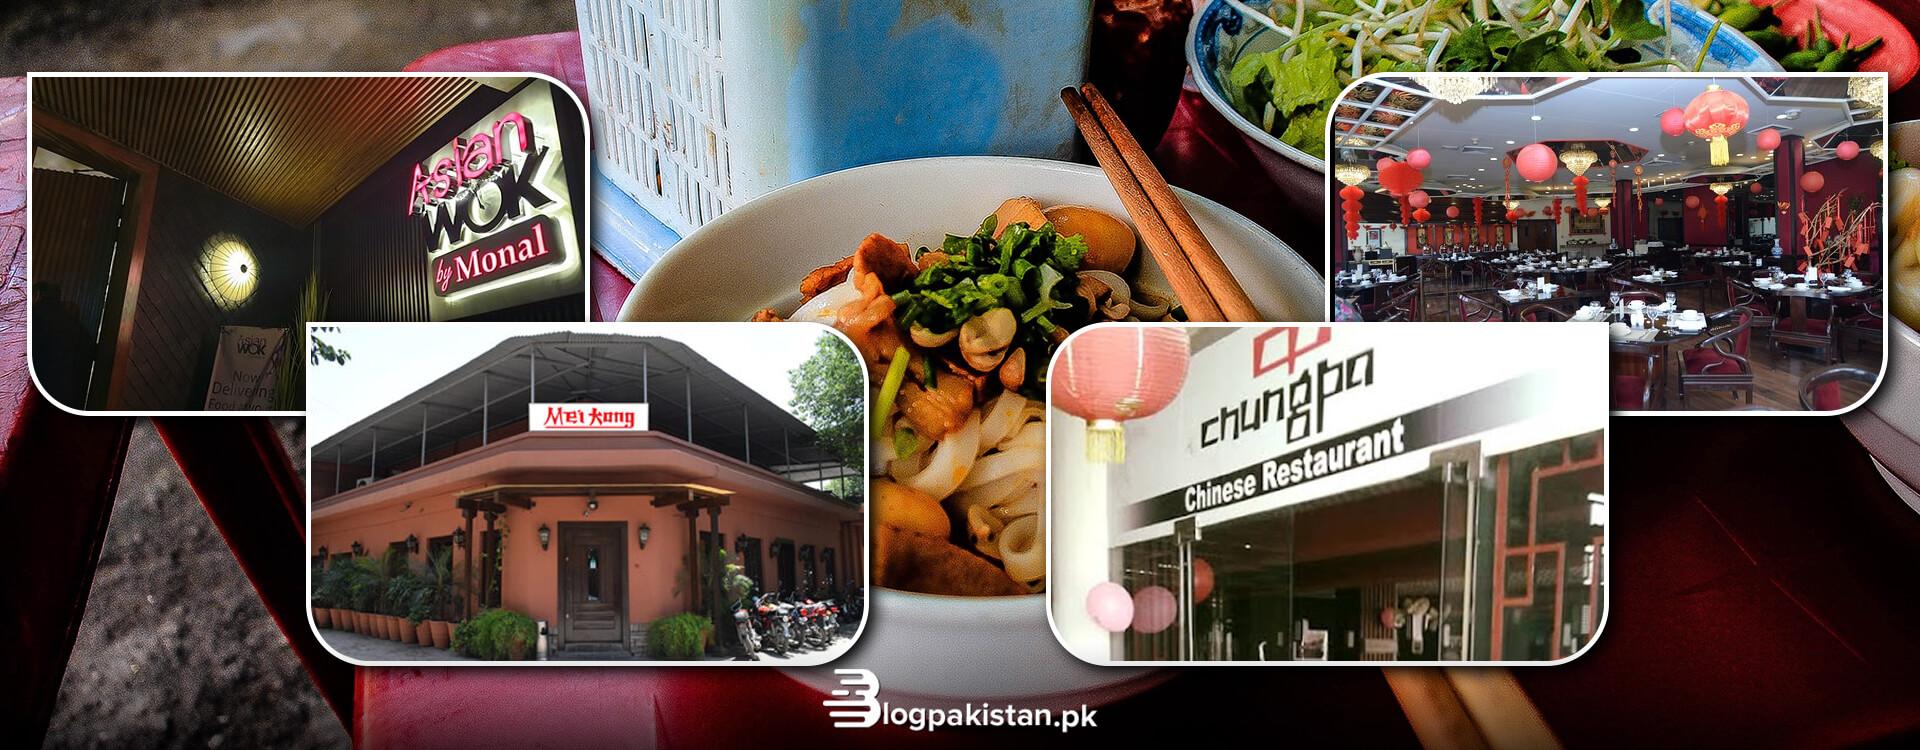 10 Best Chinese Restaurants in Rawalpindi Based On Ambiance & Taste